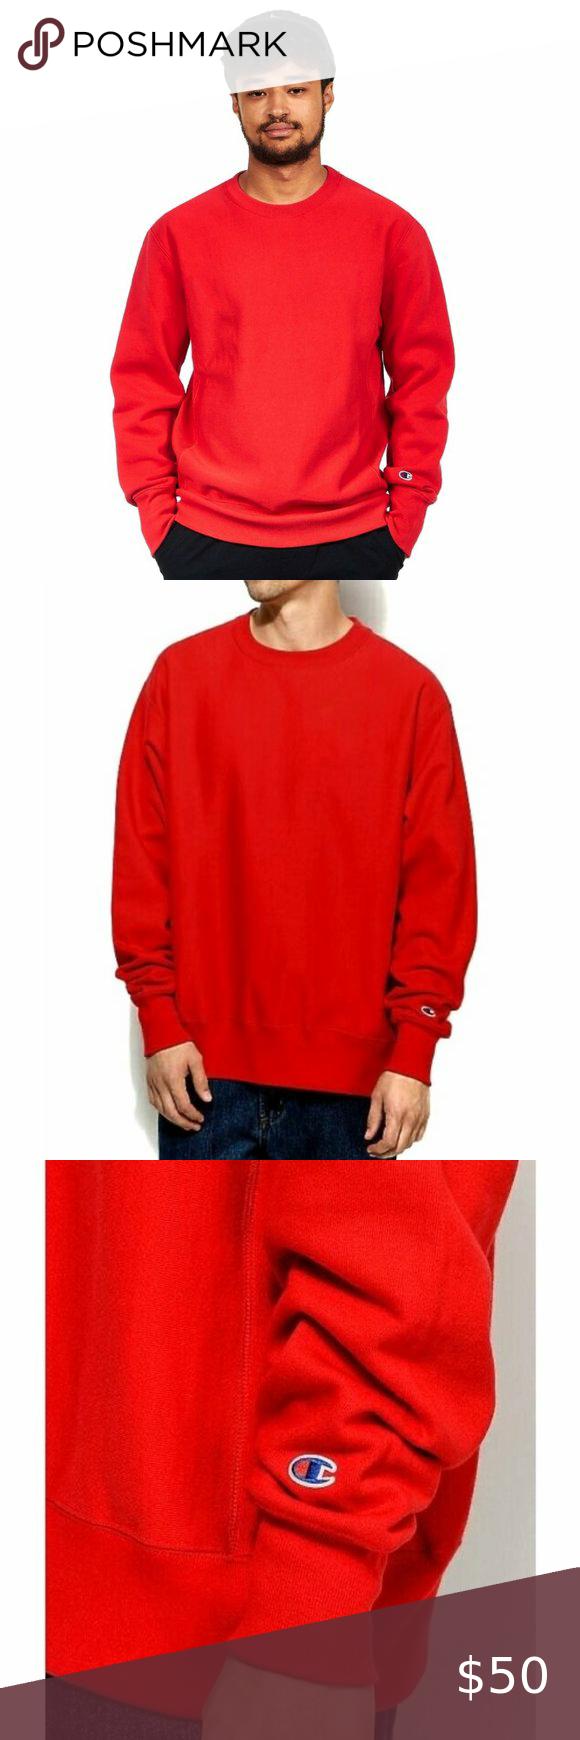 Champion Reverse Weave Red Crewneck Sweatshirt Crew Neck Sweatshirt Red Crewneck Champion Reverse Weave [ 1740 x 580 Pixel ]